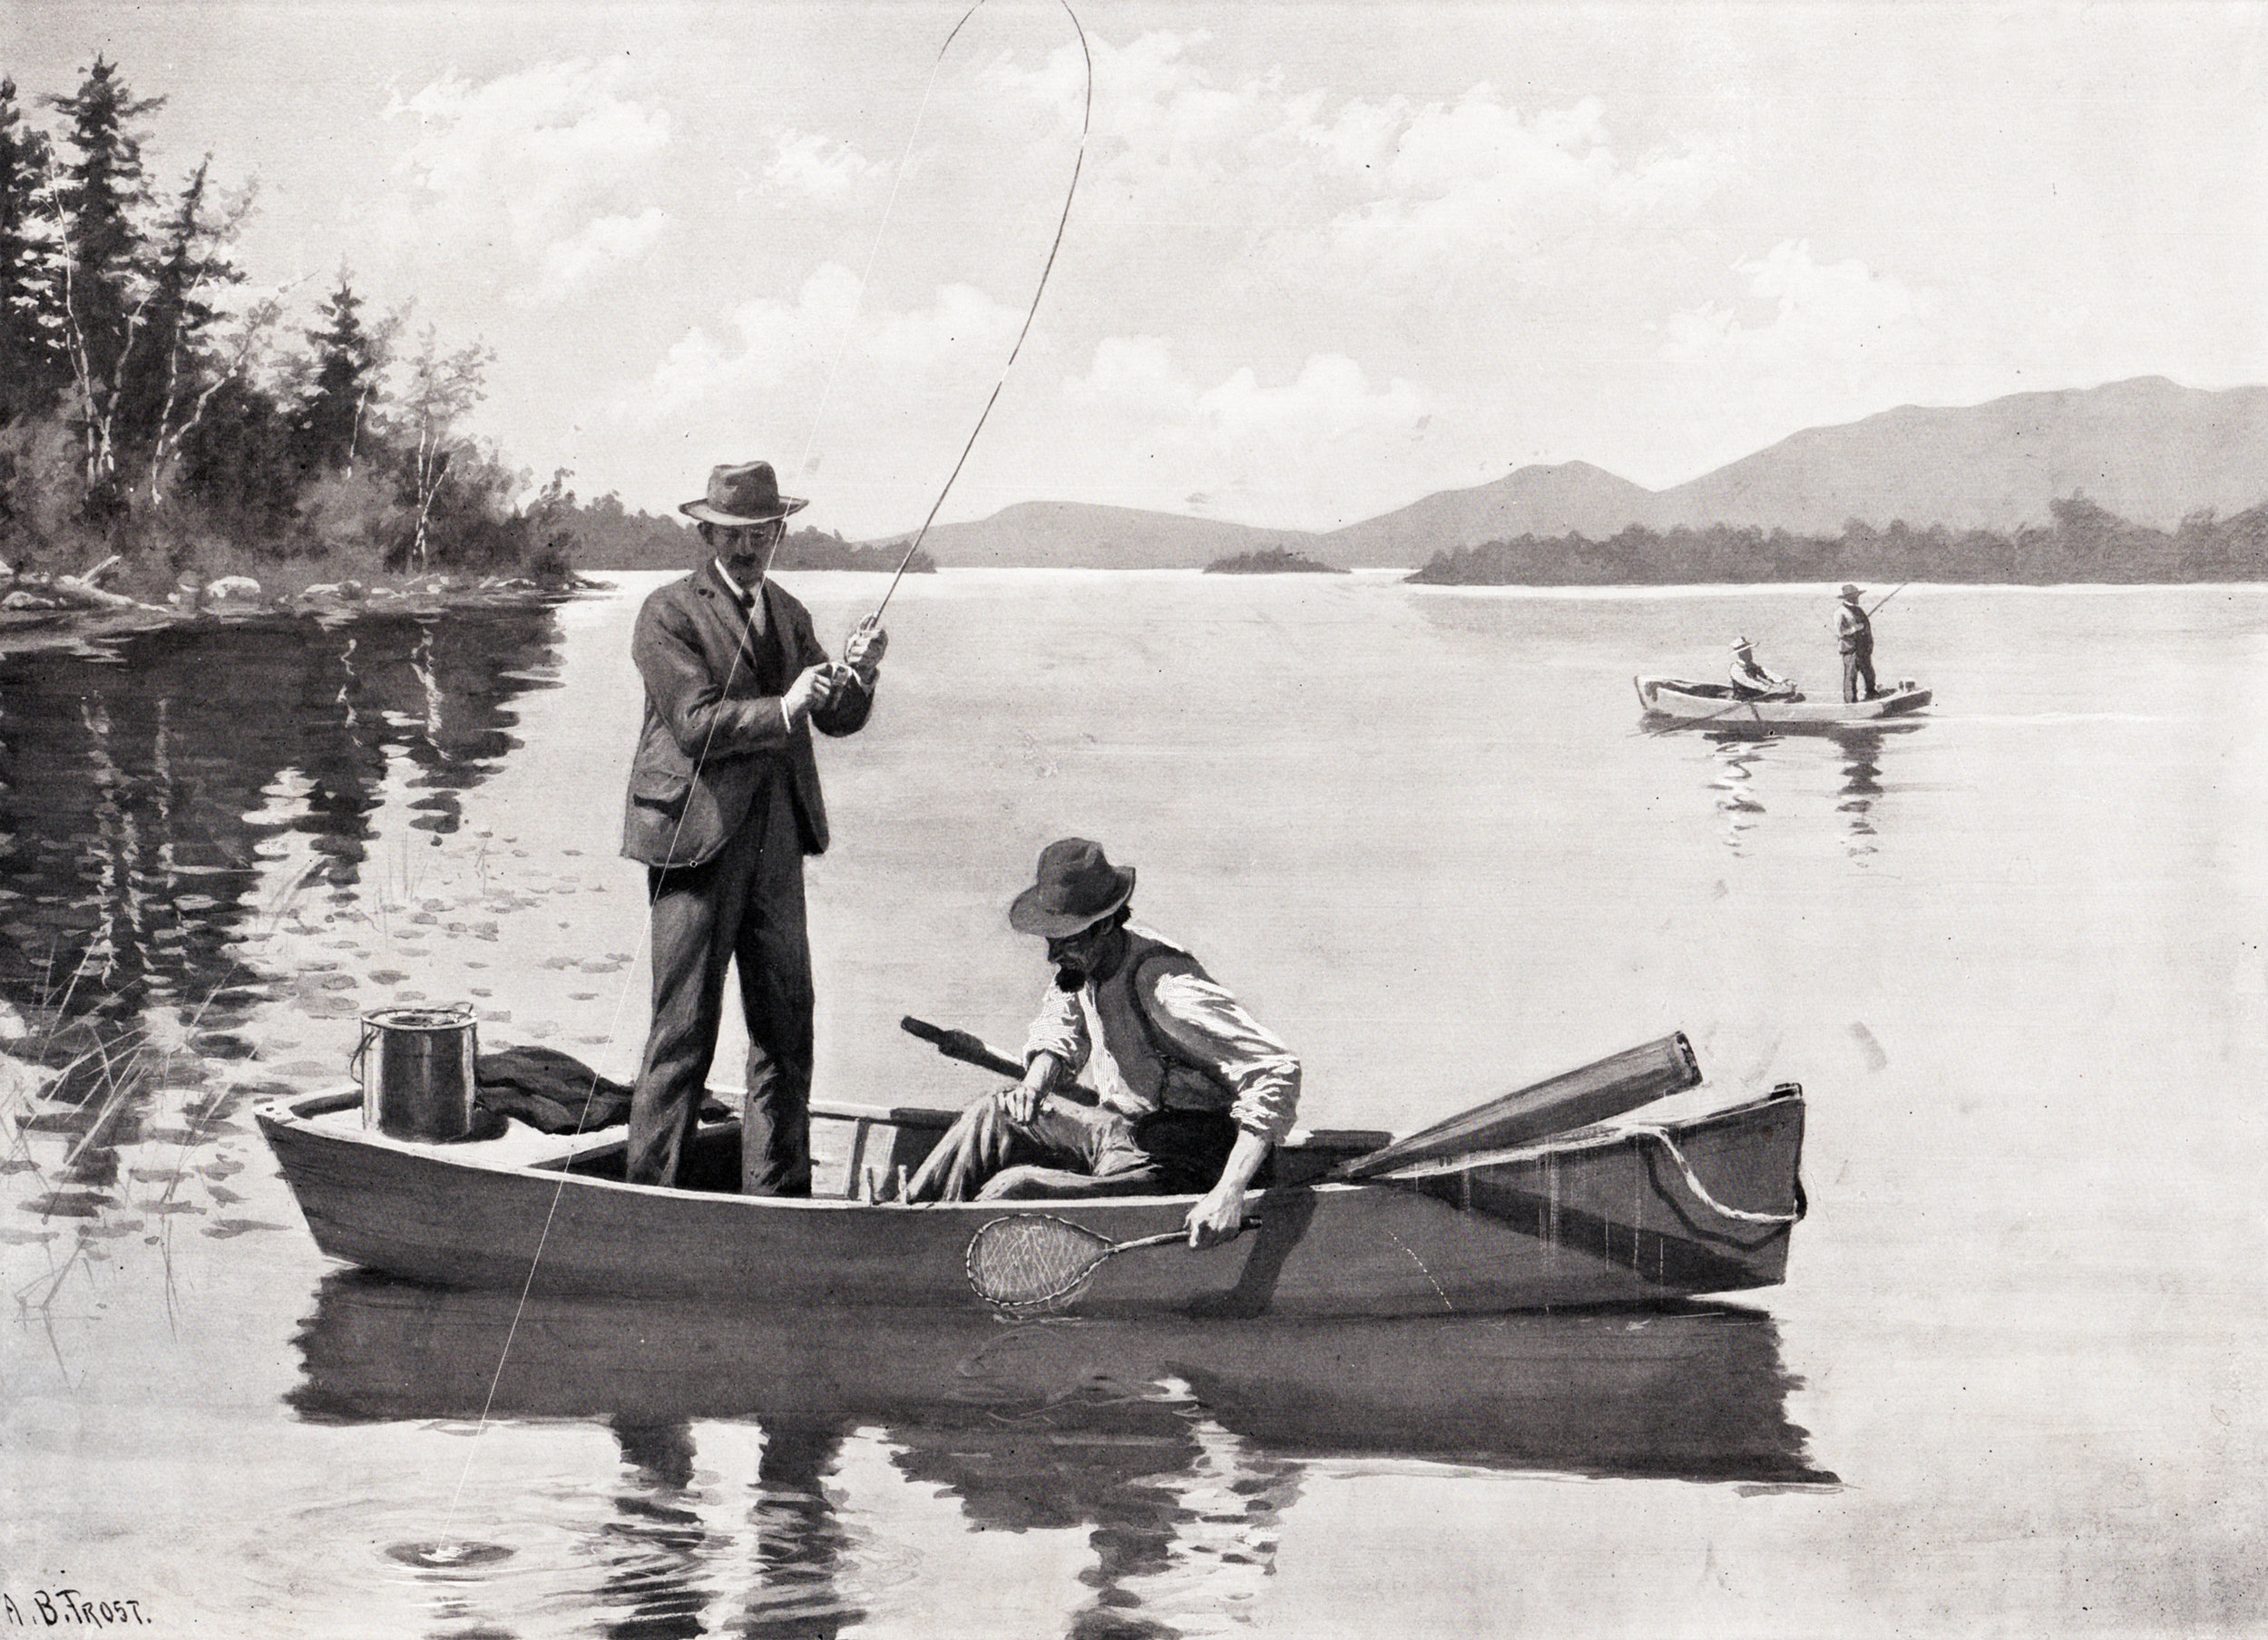 Frost, A.B. hunting & fishing prints (1904)